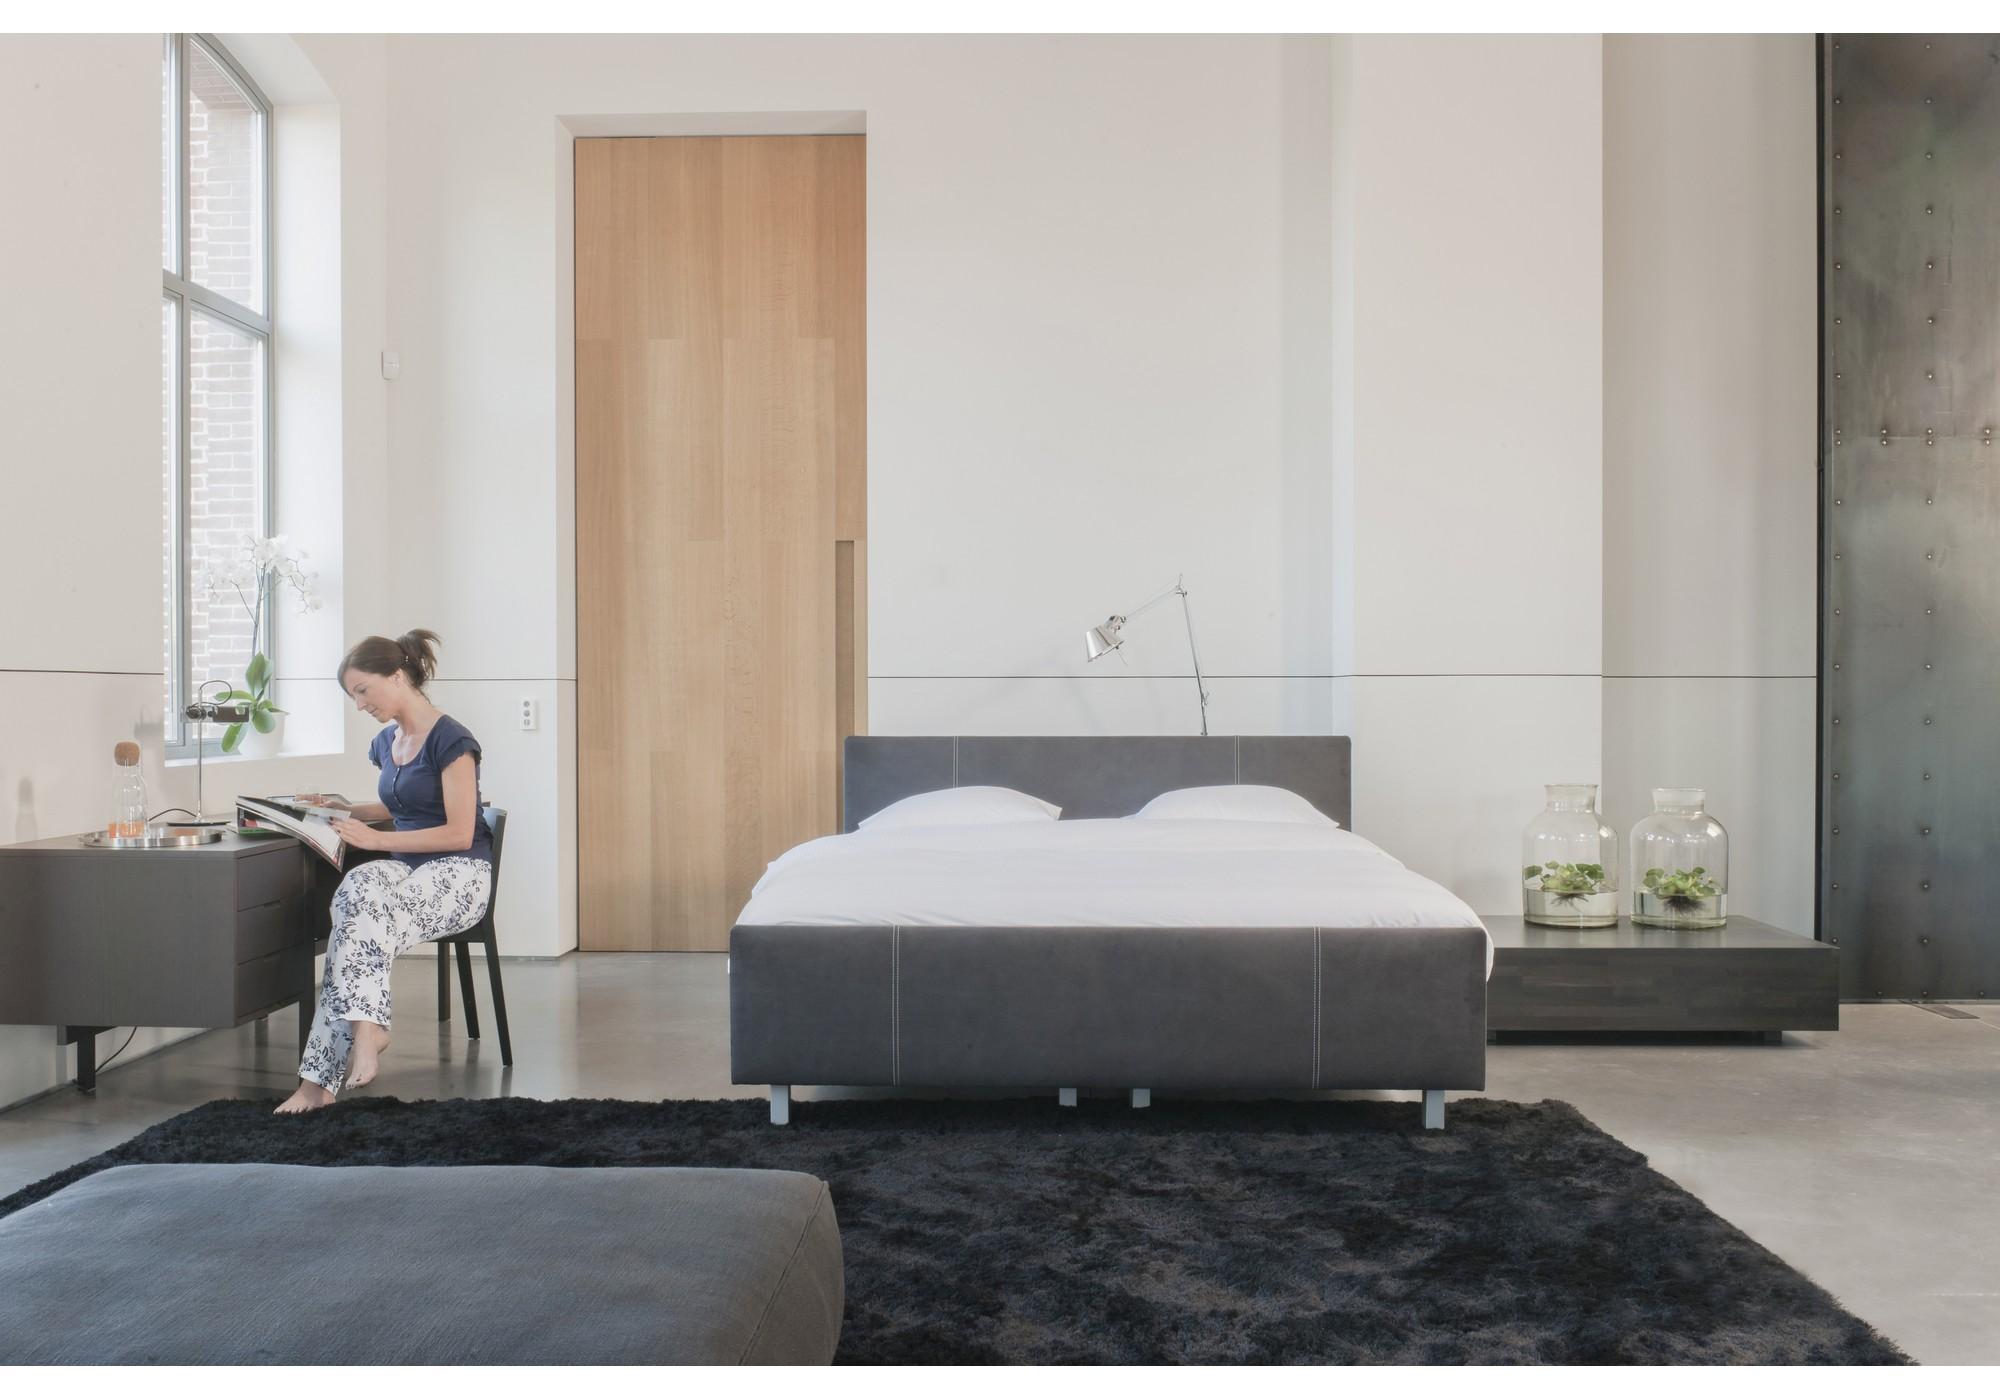 kreamat boxspringbett mit kopfteil penola betten kraft. Black Bedroom Furniture Sets. Home Design Ideas